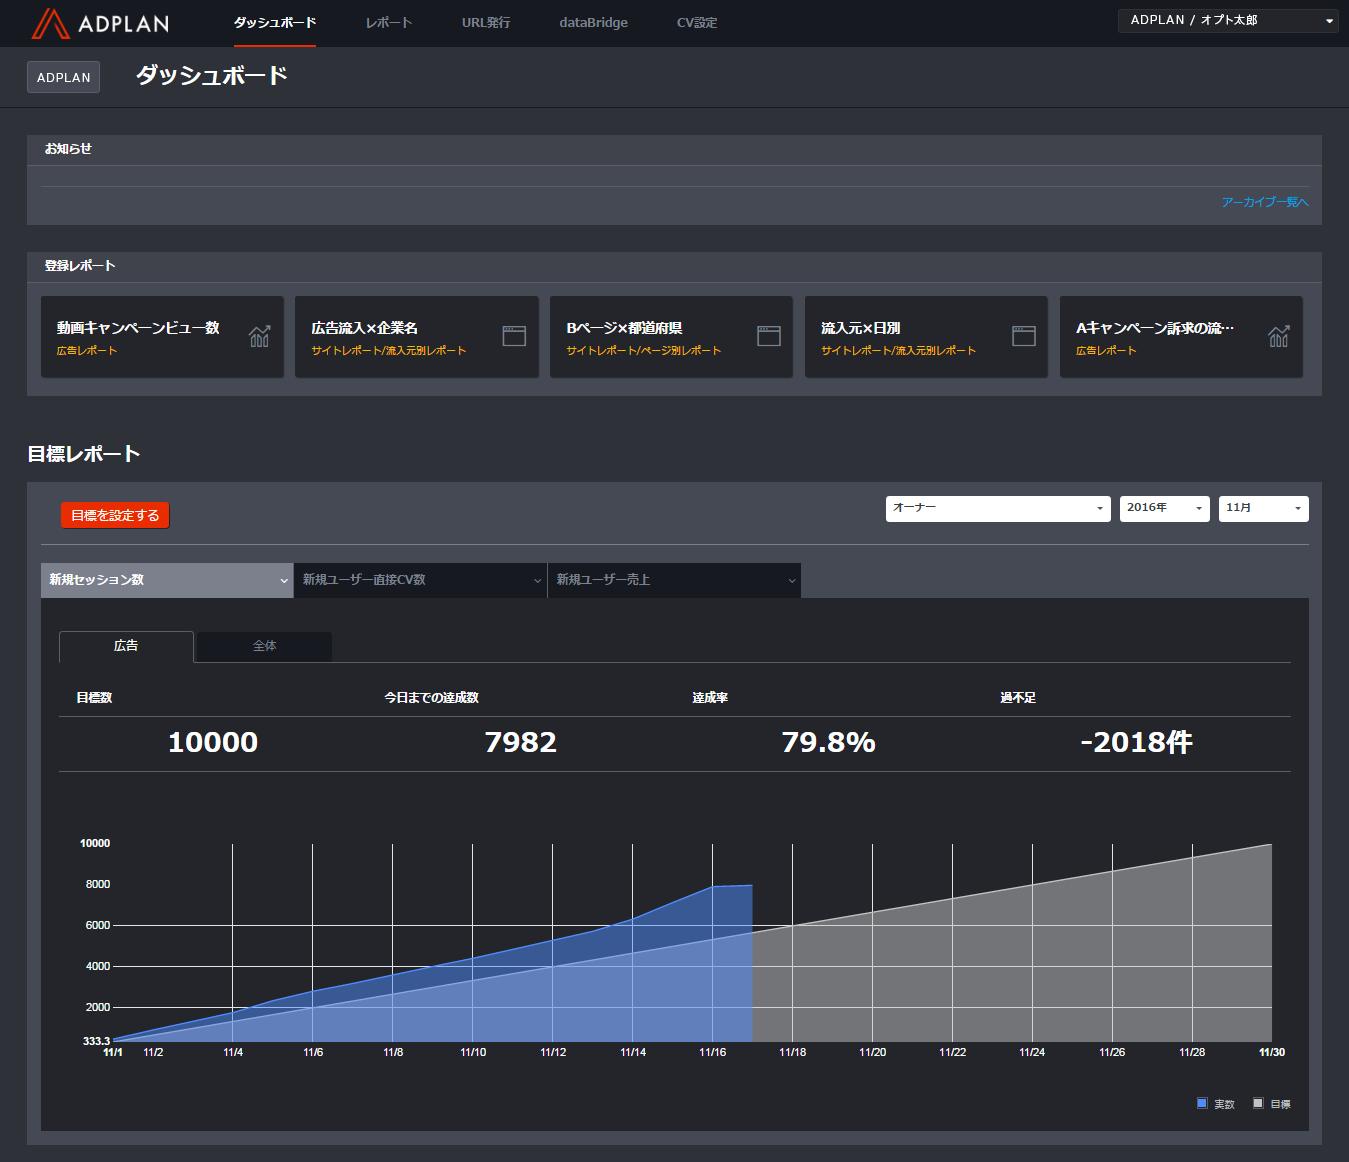 ADPLAN screenshot